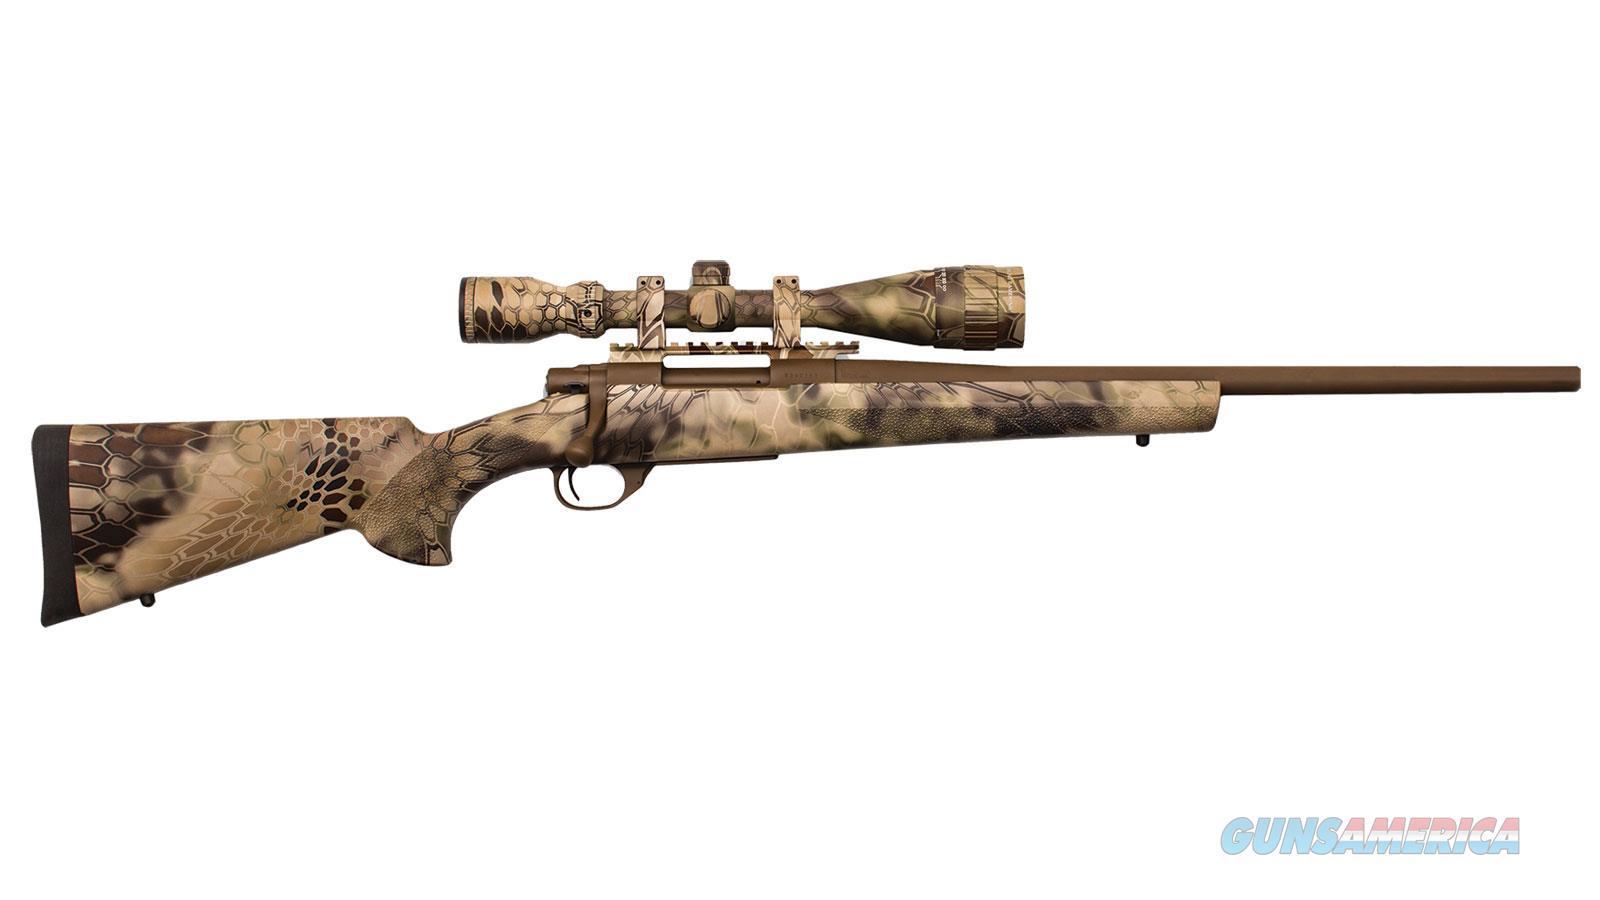 Legacy Sports Hogue Kryp Hb Pkg 22-250 HKF91227KH+AB  Guns > Rifles > L Misc Rifles